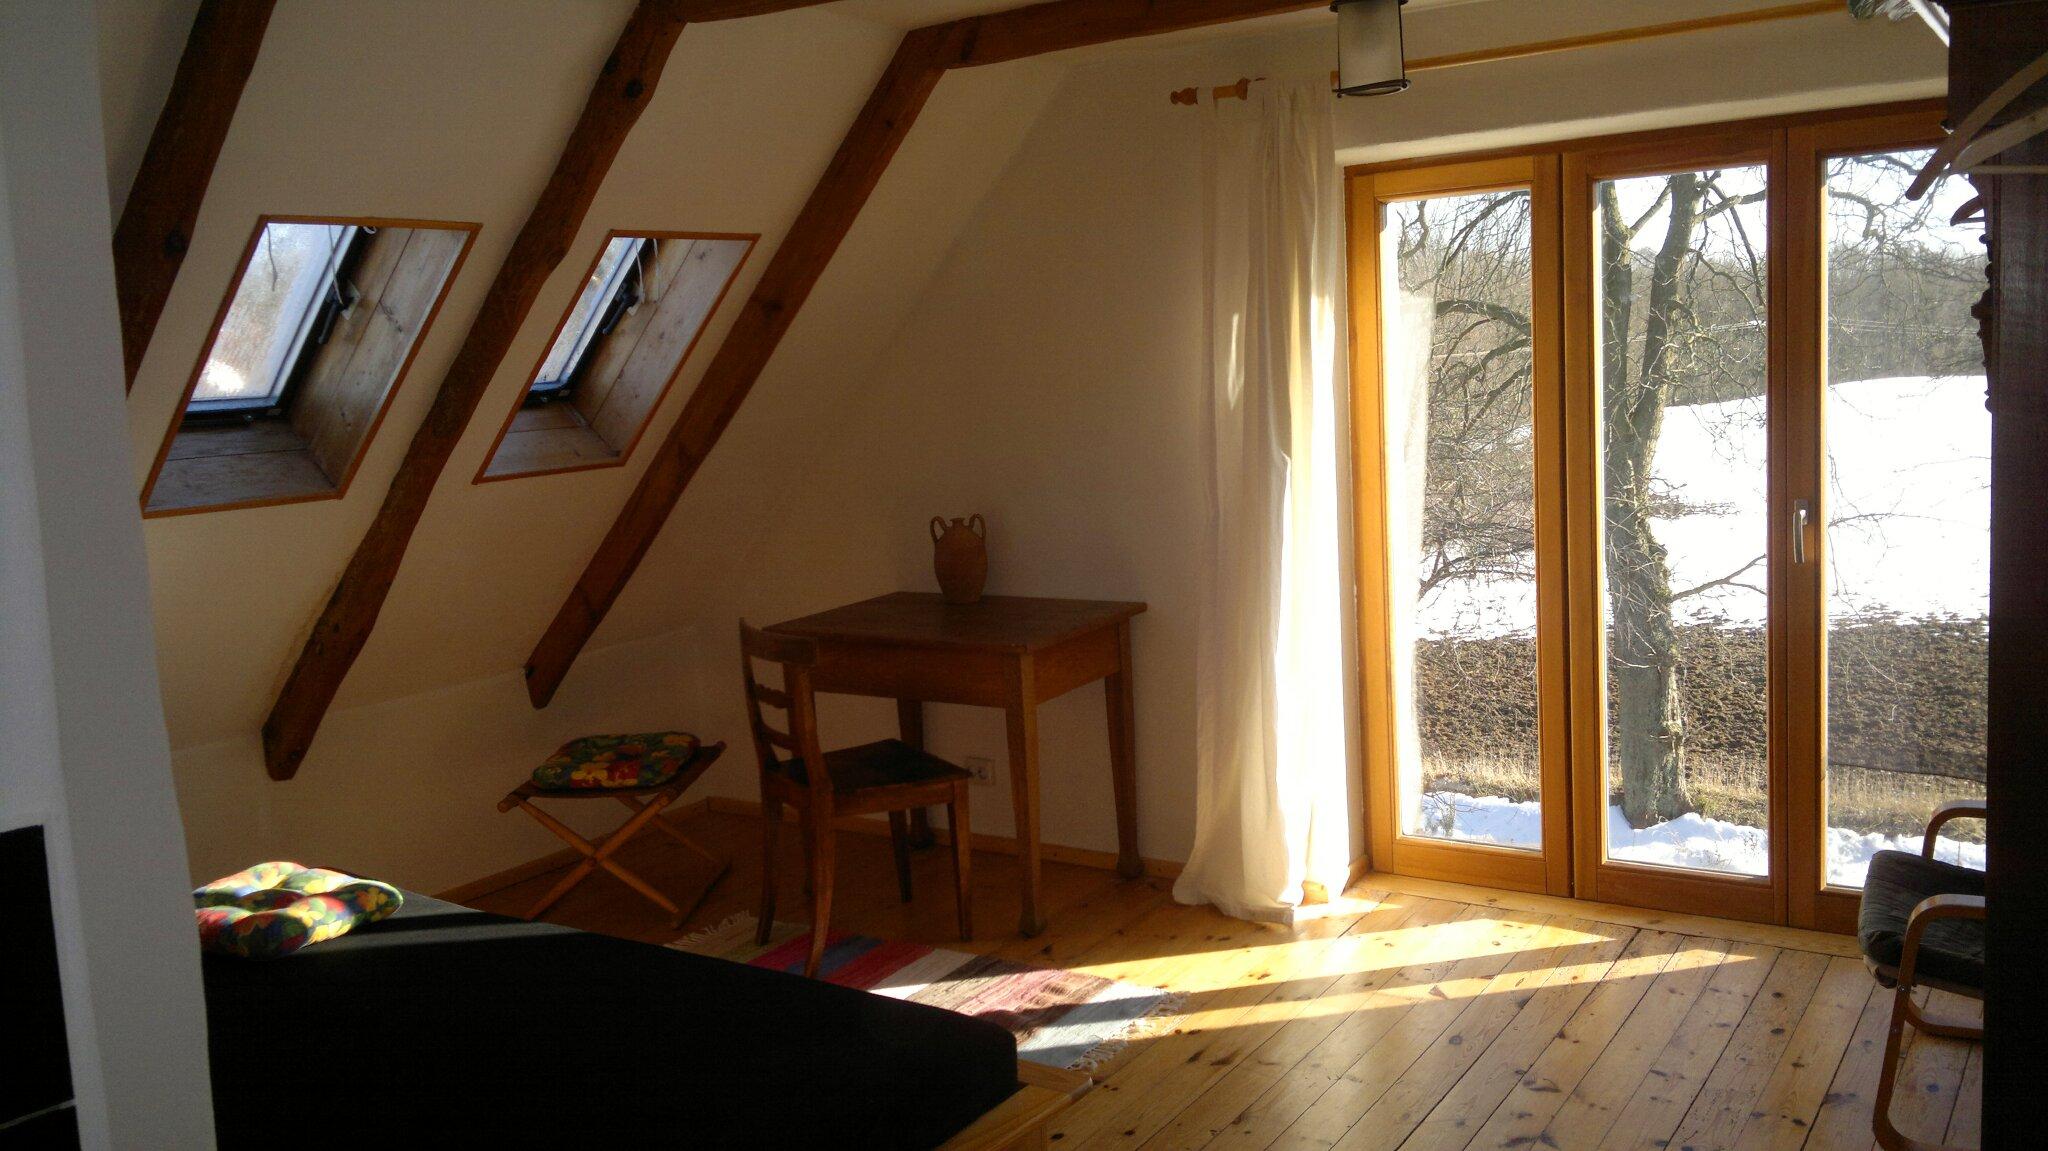 Zimmer 1.OG mit Blick nach Süden